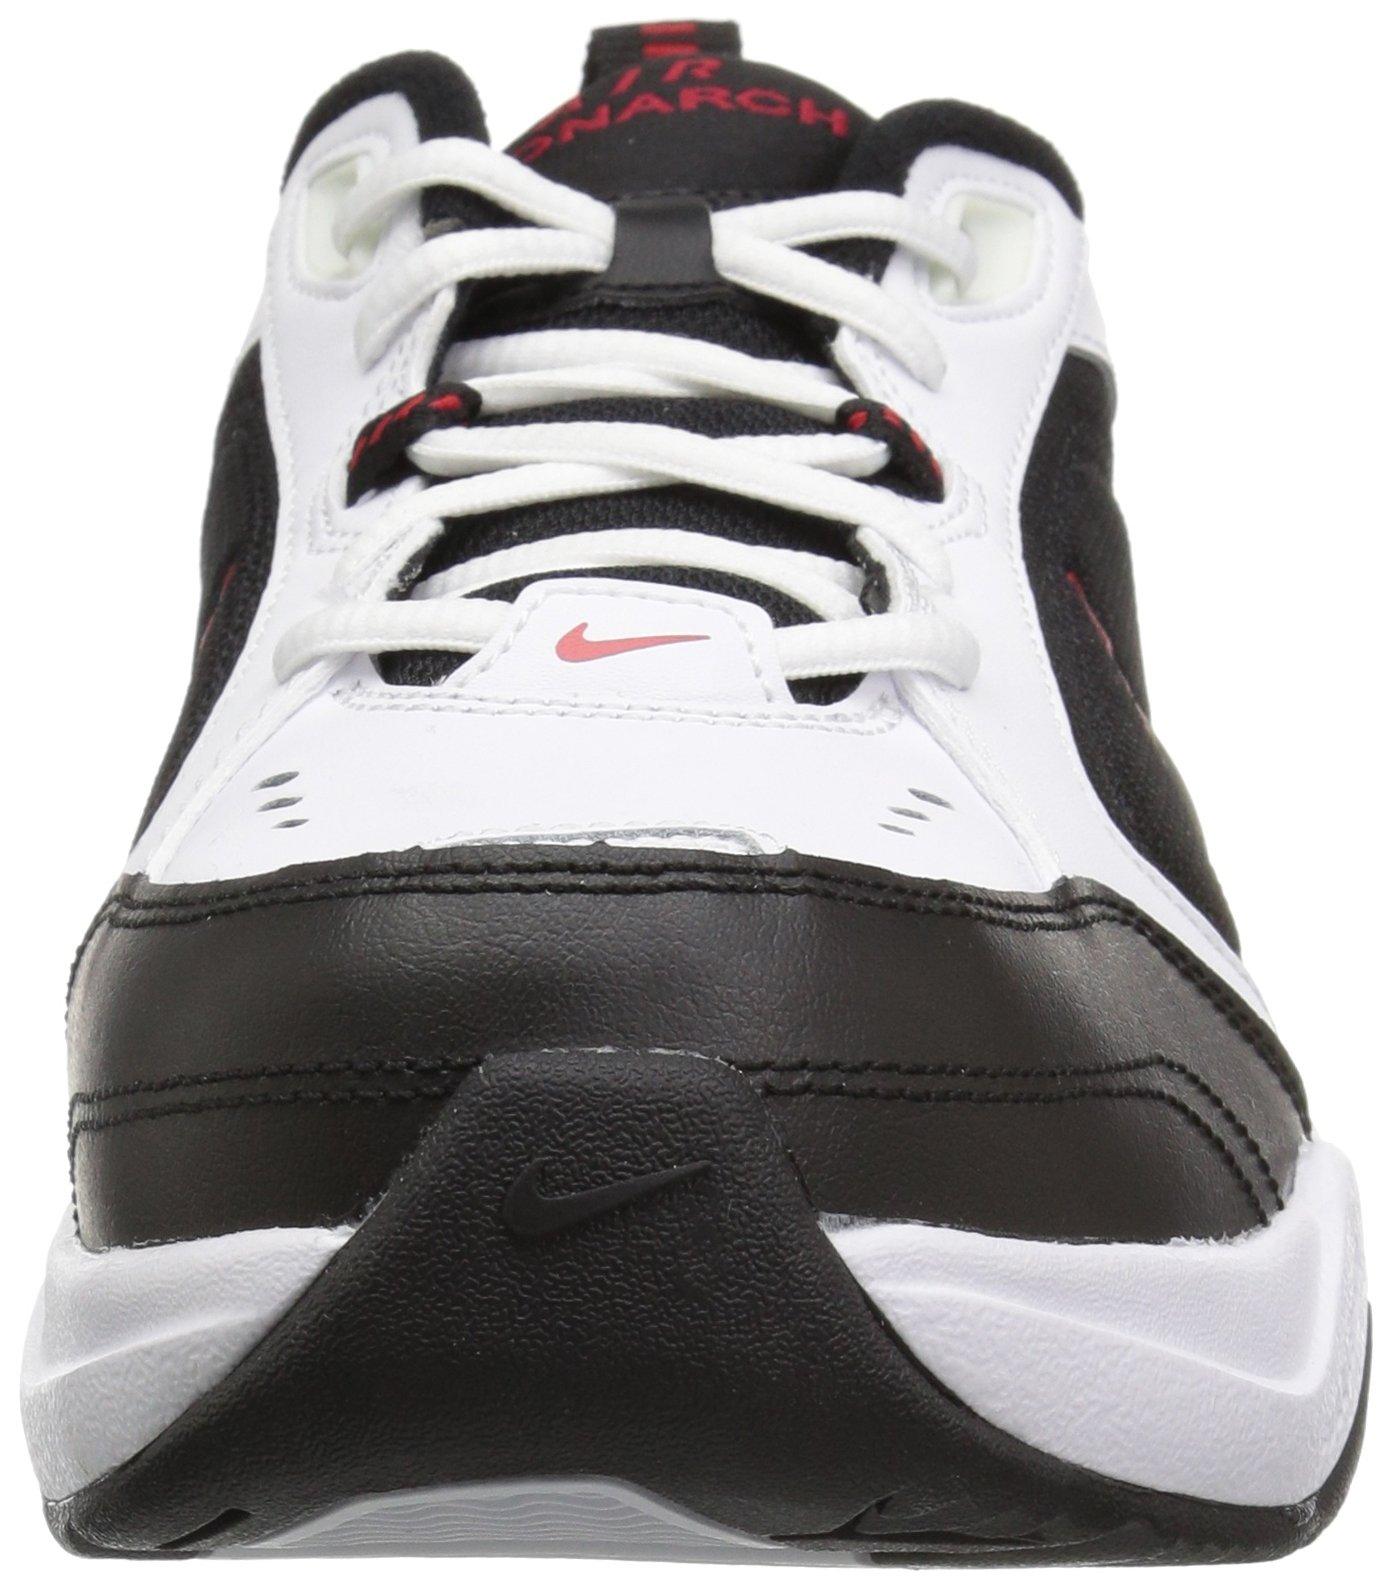 Nike-Men-039-s-Air-Monarch-IV-Cross-Trainer-Sneaker-416355 thumbnail 11